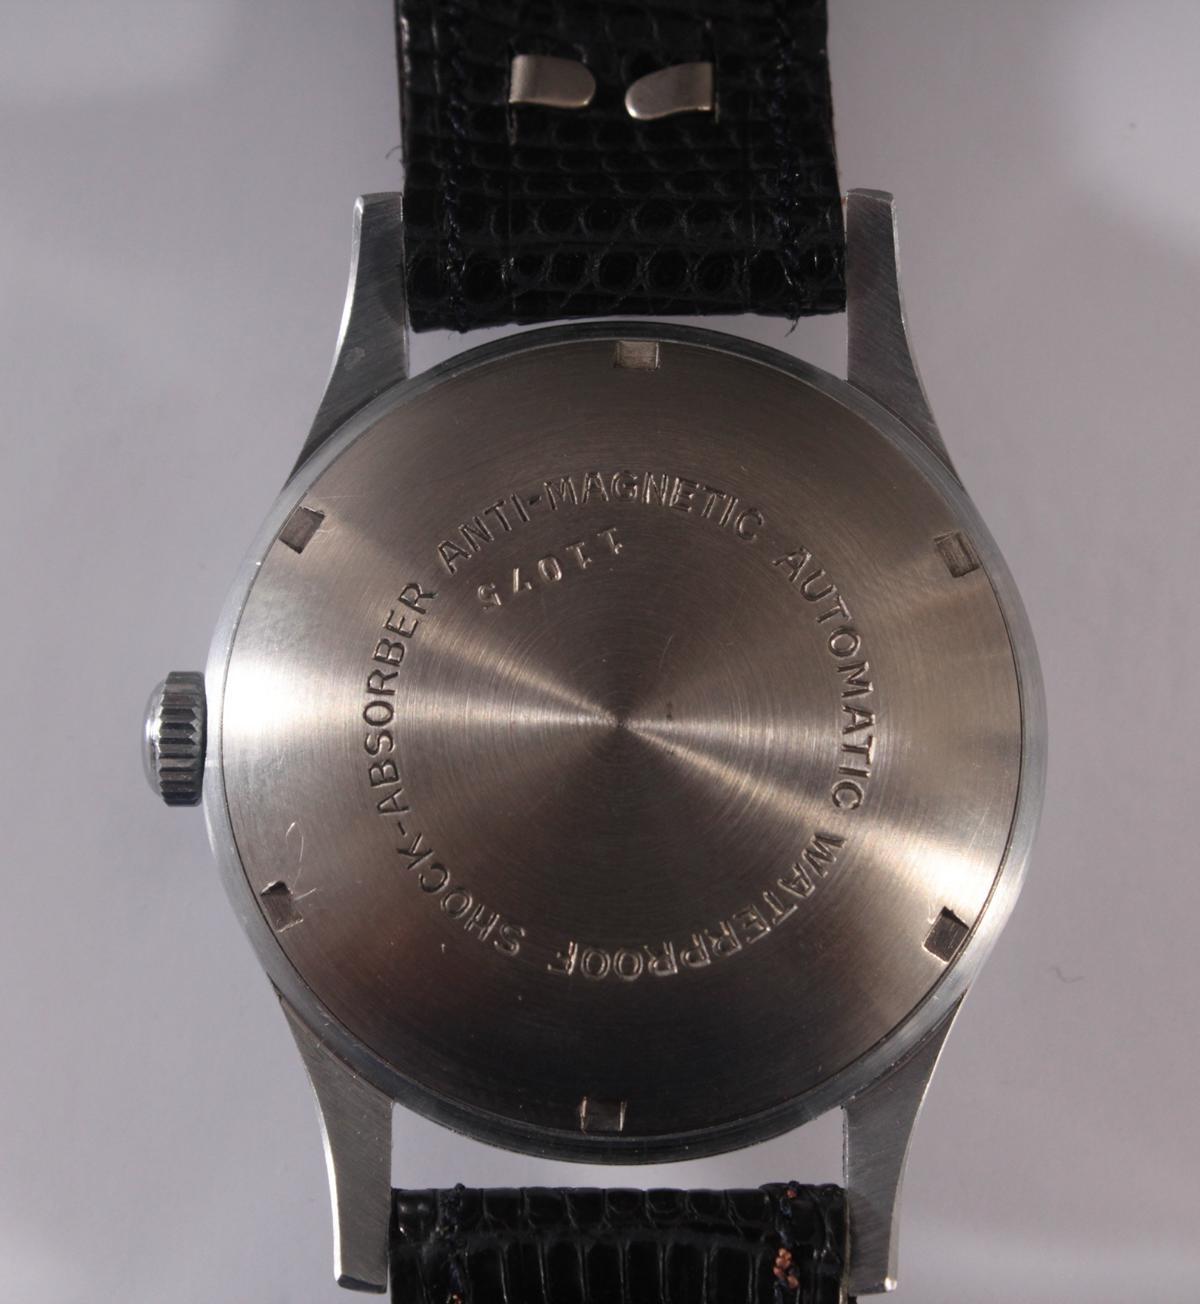 Herrenarmbanduhr der Marke Comint Automatic-4